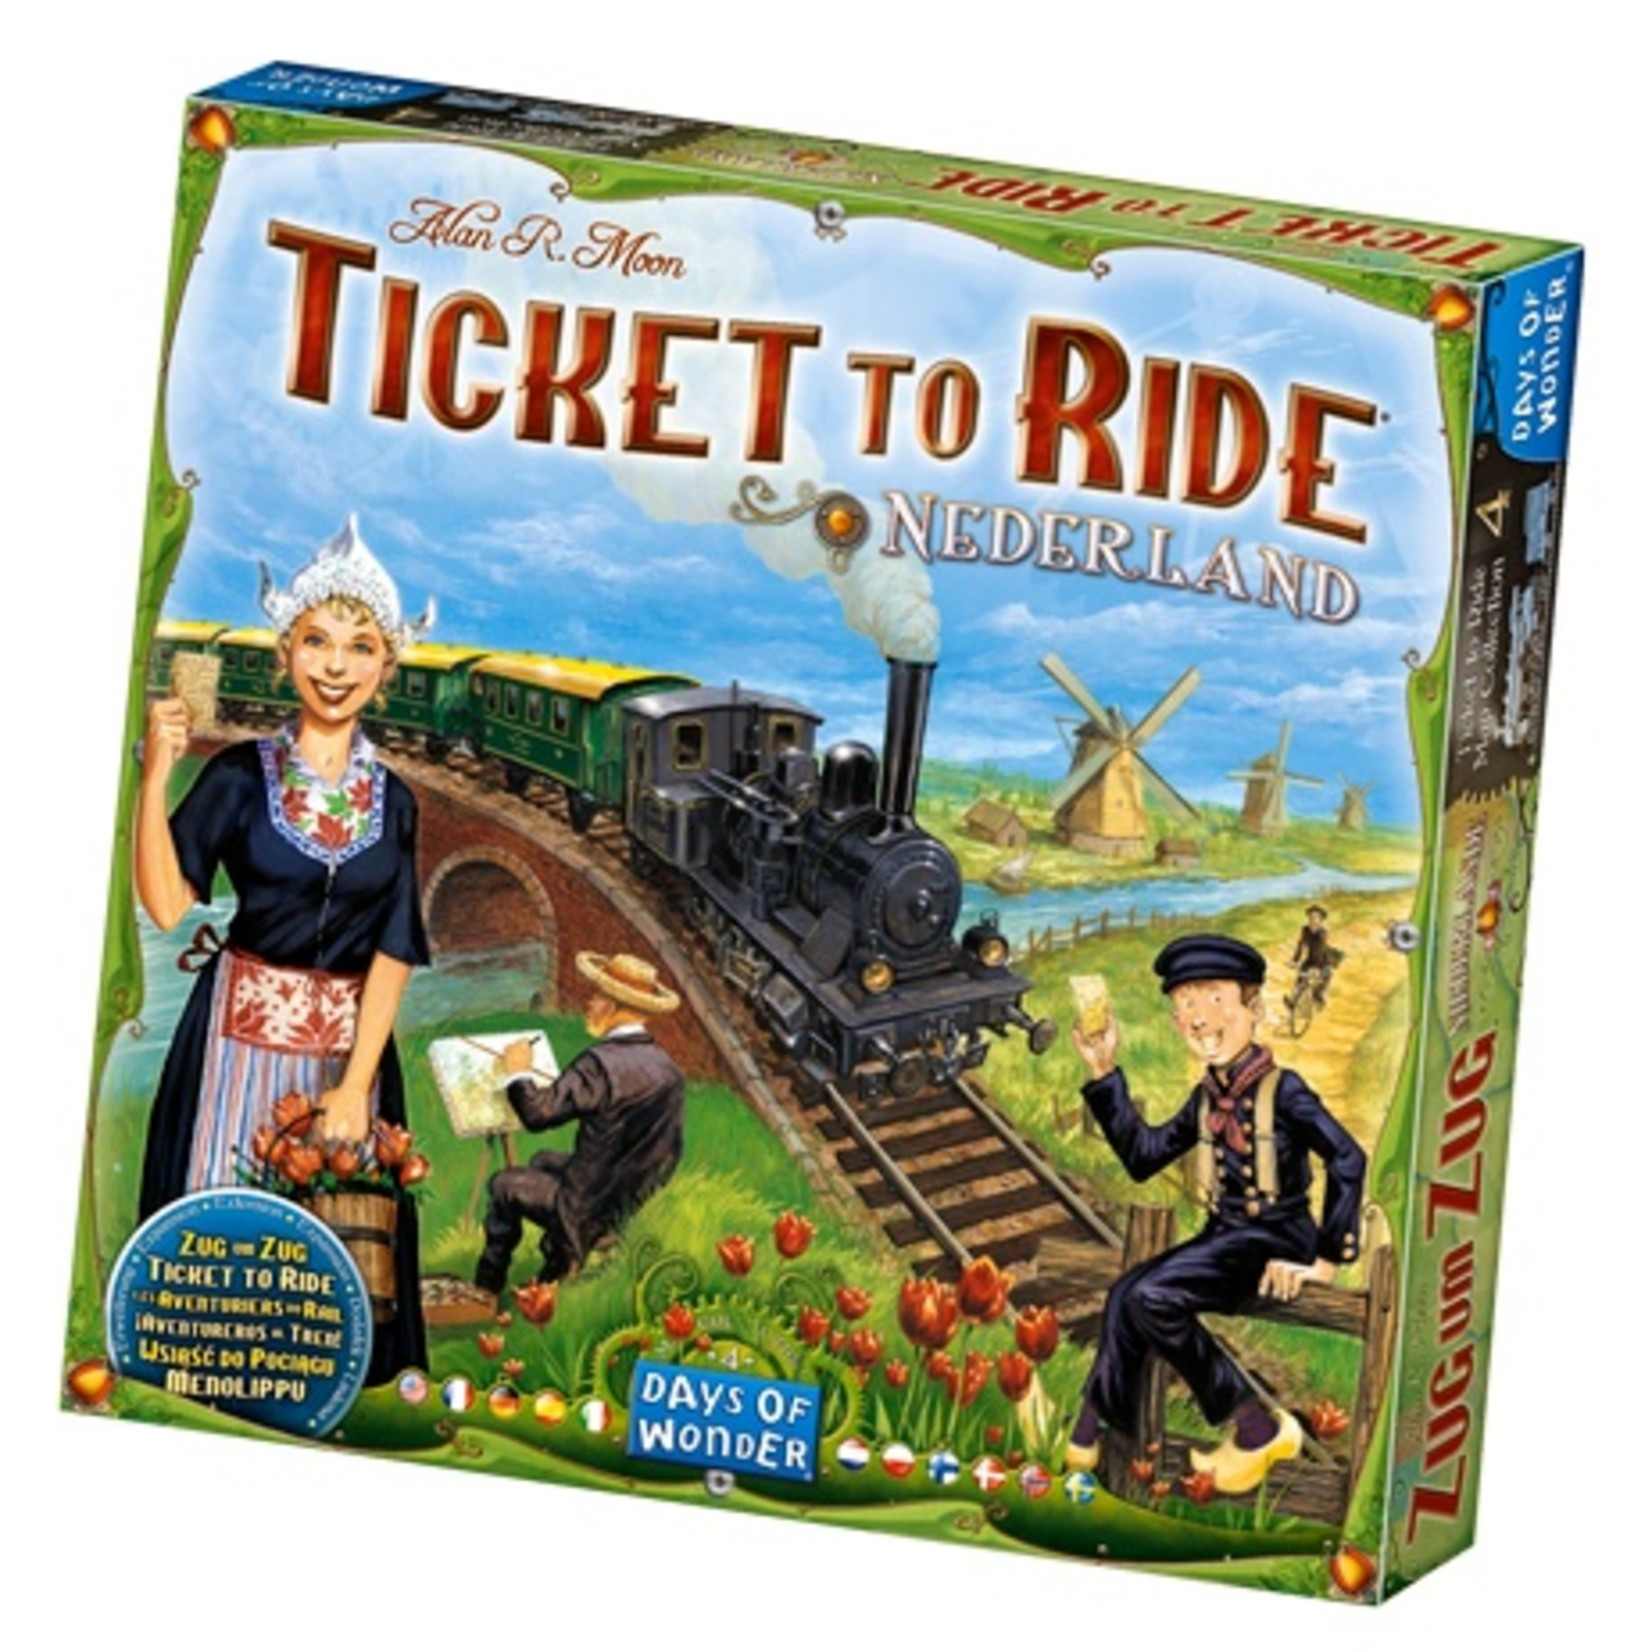 Days of Wonder Ticket to Ride: Nederlands Expansion